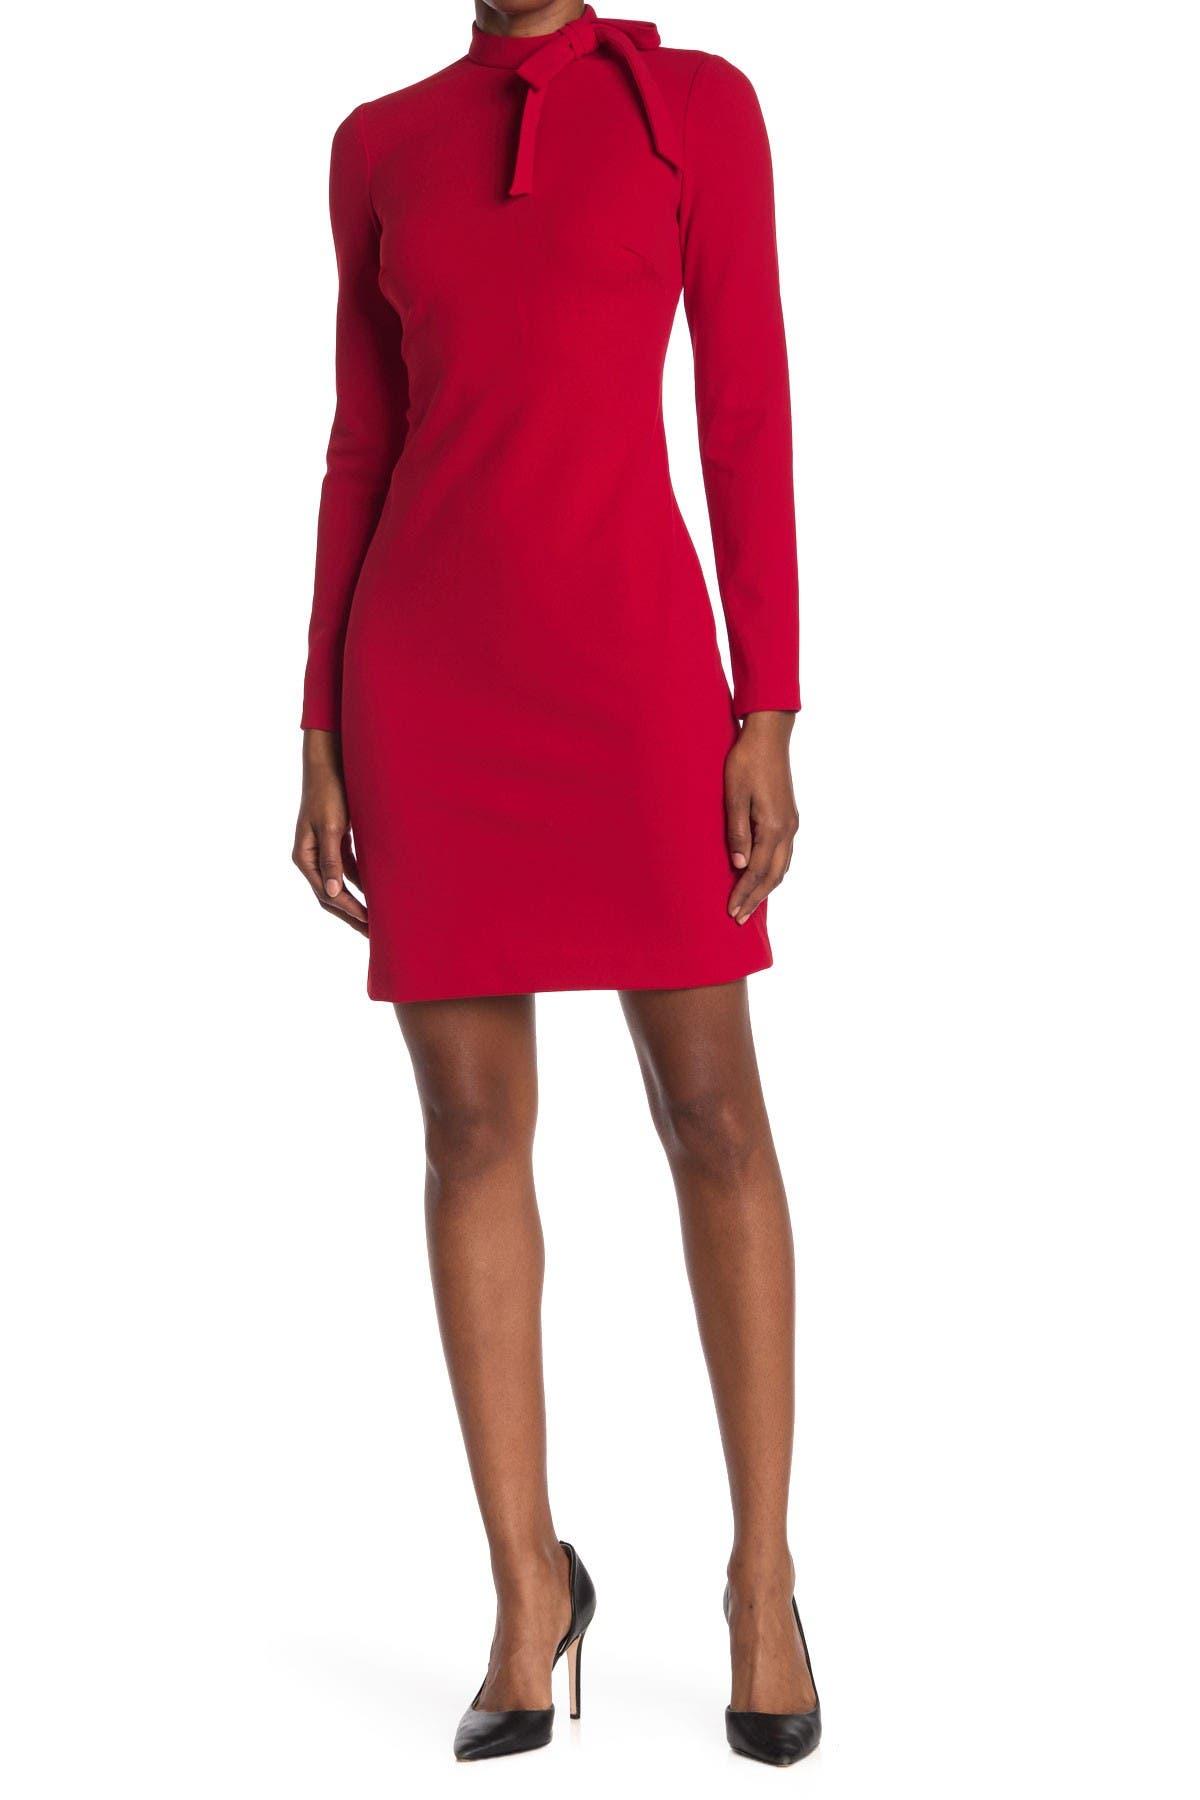 Image of Calvin Klein Tie Neck Long Sleeve Dress